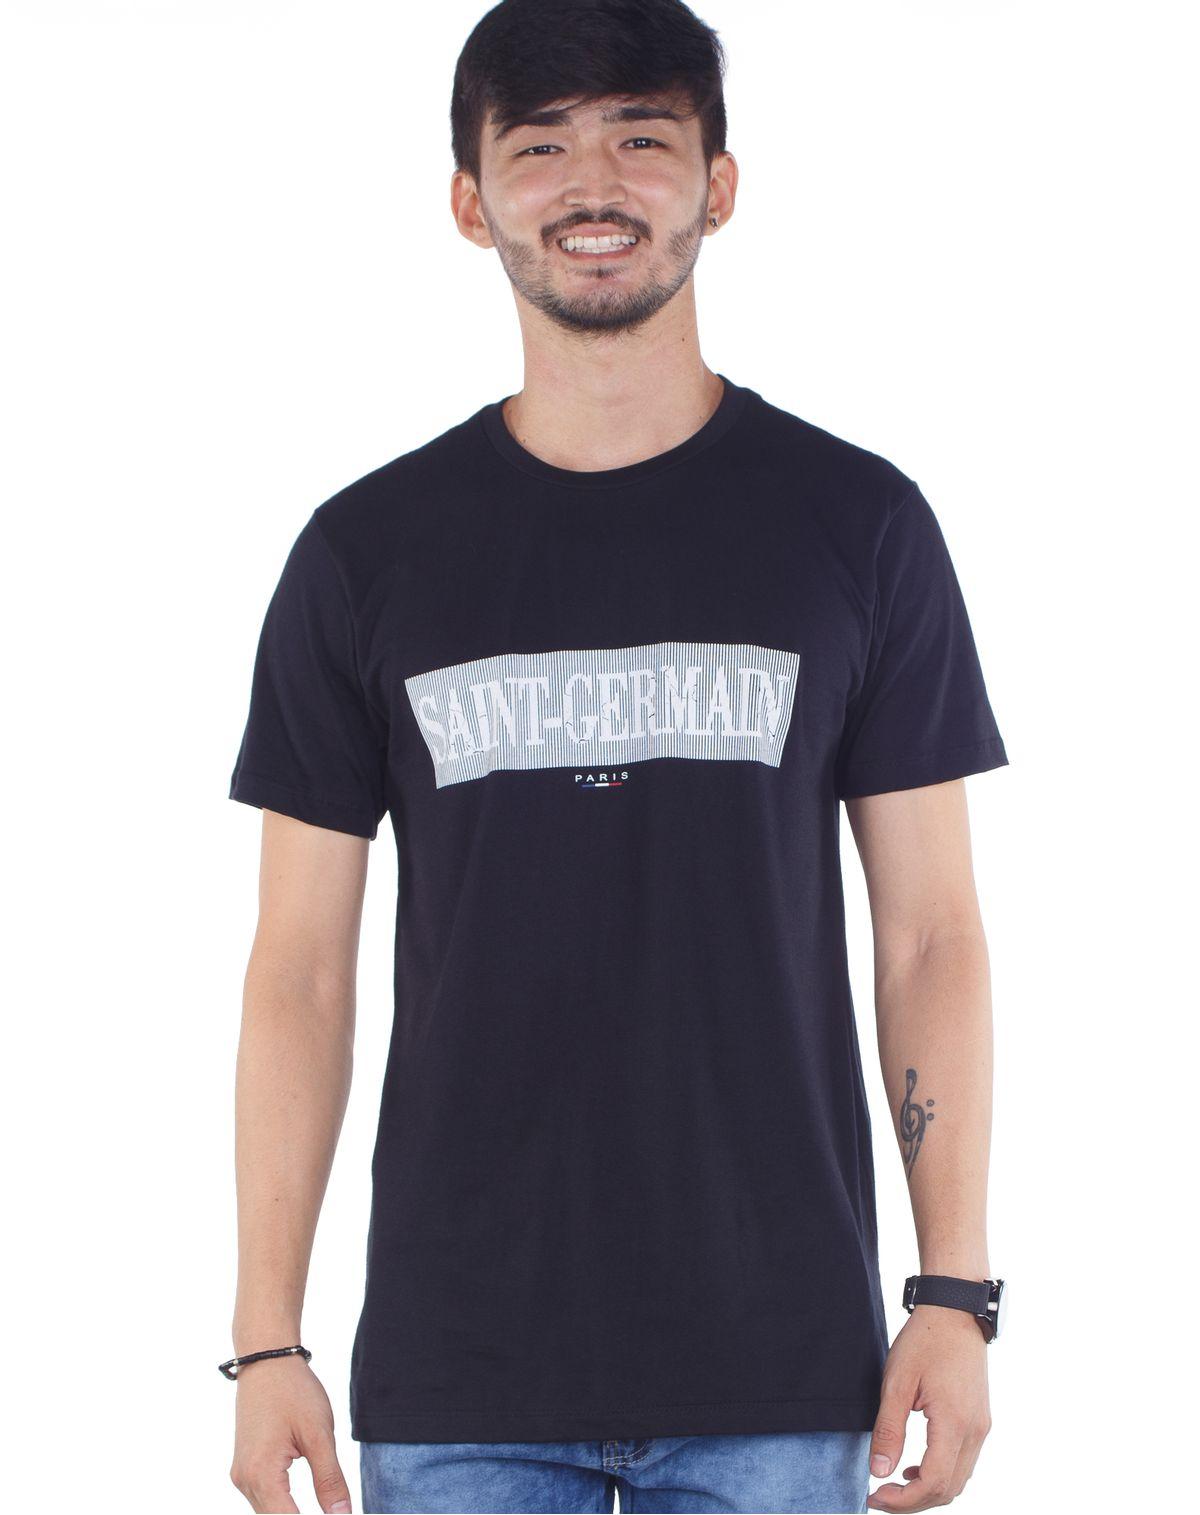 567479003-camiseta-masculina-estampa-frontal-preto-g-bfa